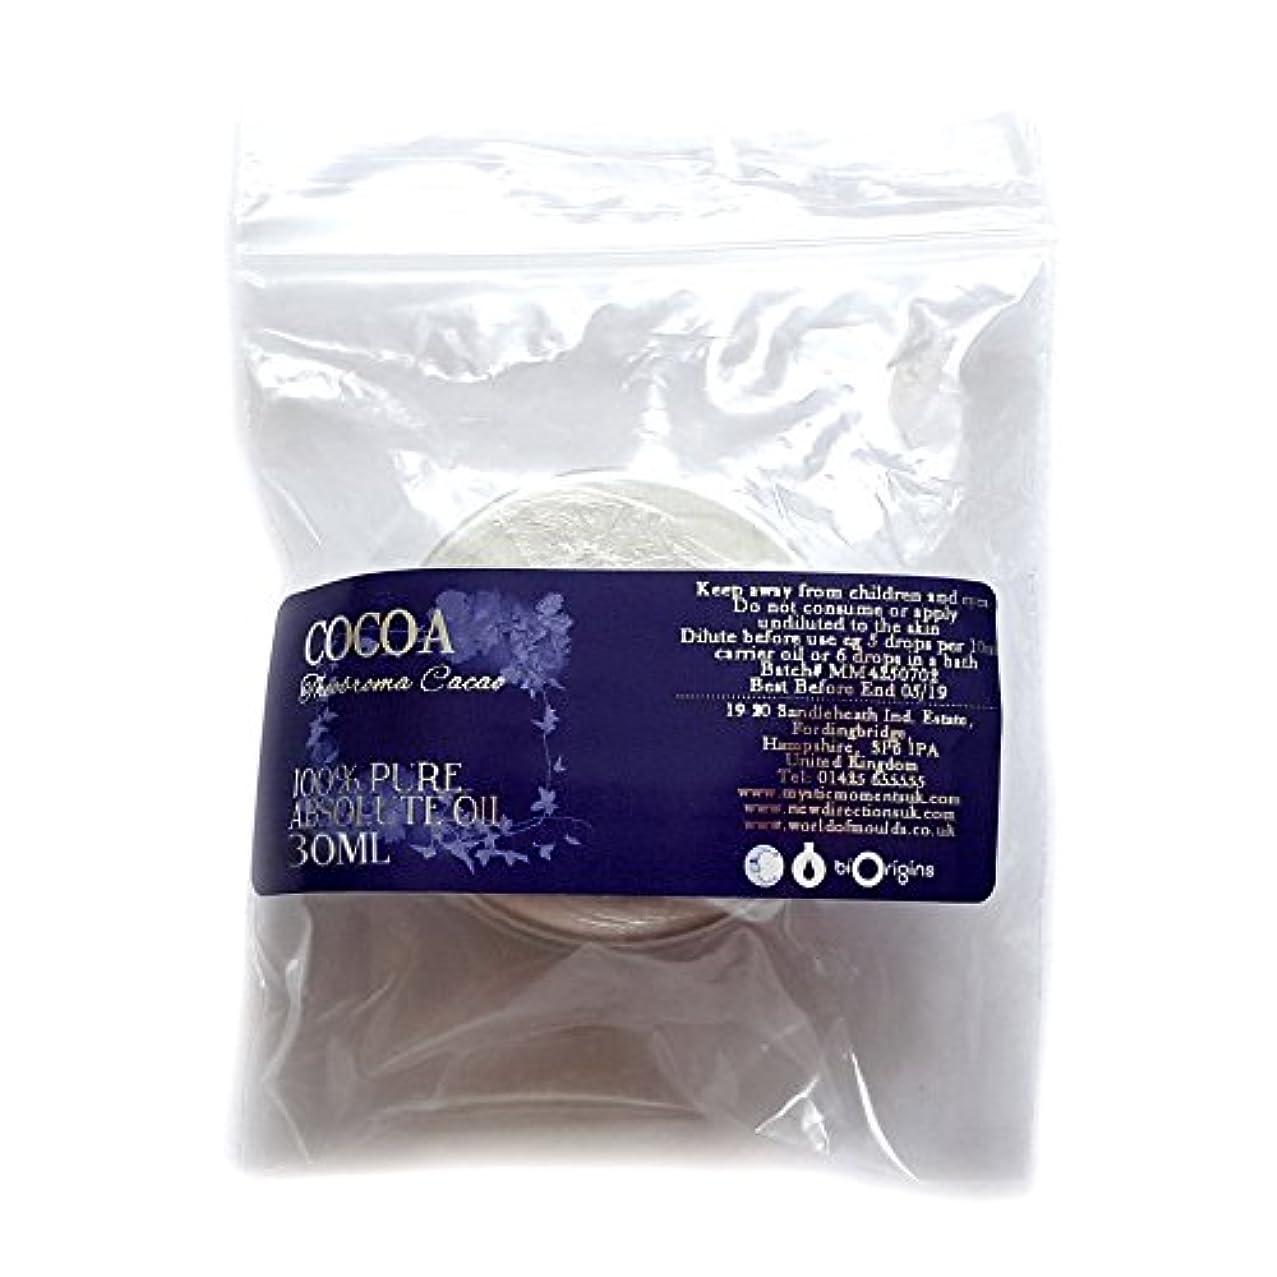 Cocoa Absolute 30ml - 100% Pure